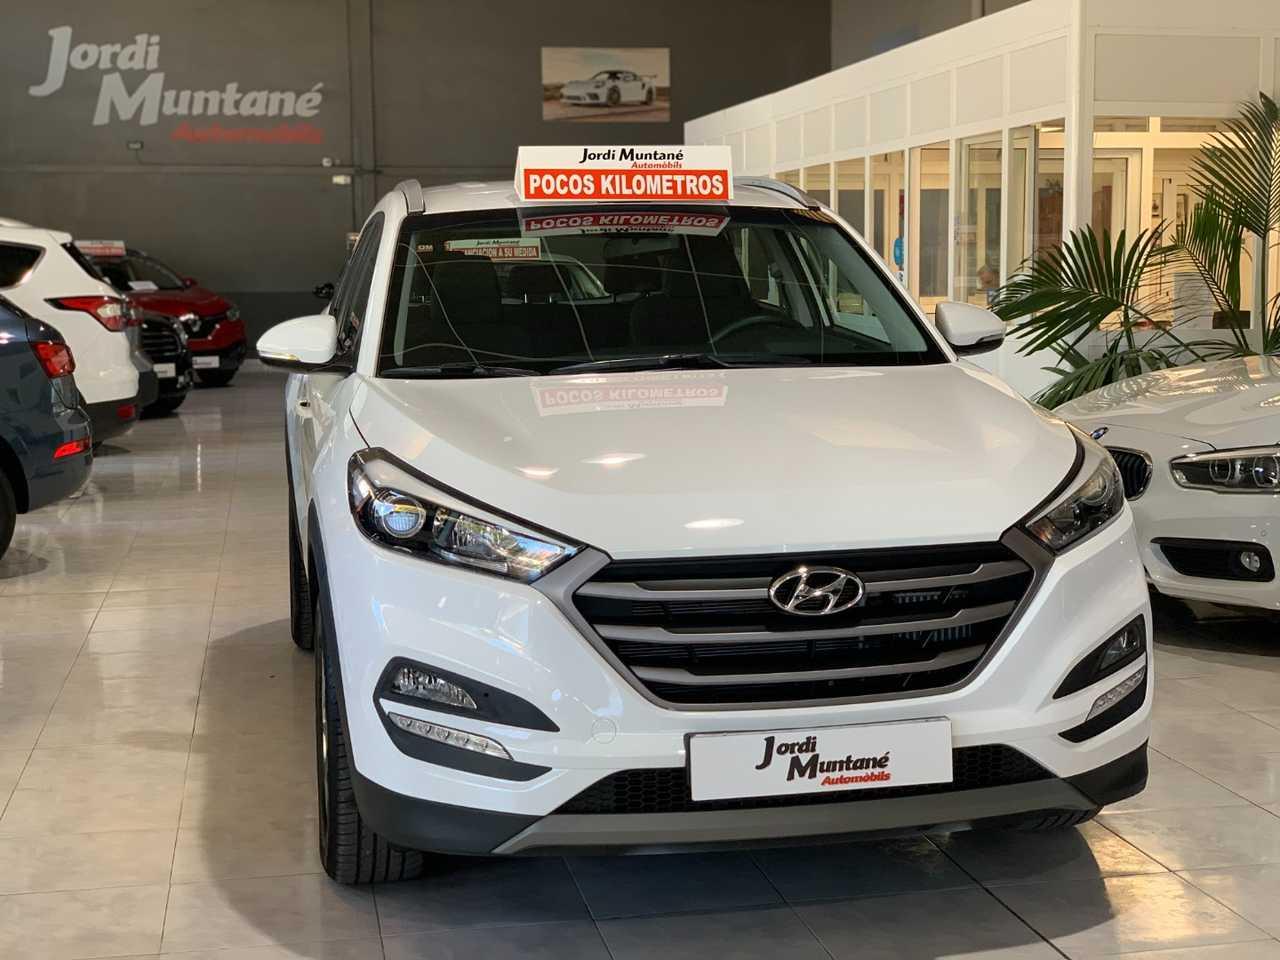 Hyundai Tucson 1.7 CRDI 115cv Blue Drive Link 4x2 .- SOLO 18.676 KM -.